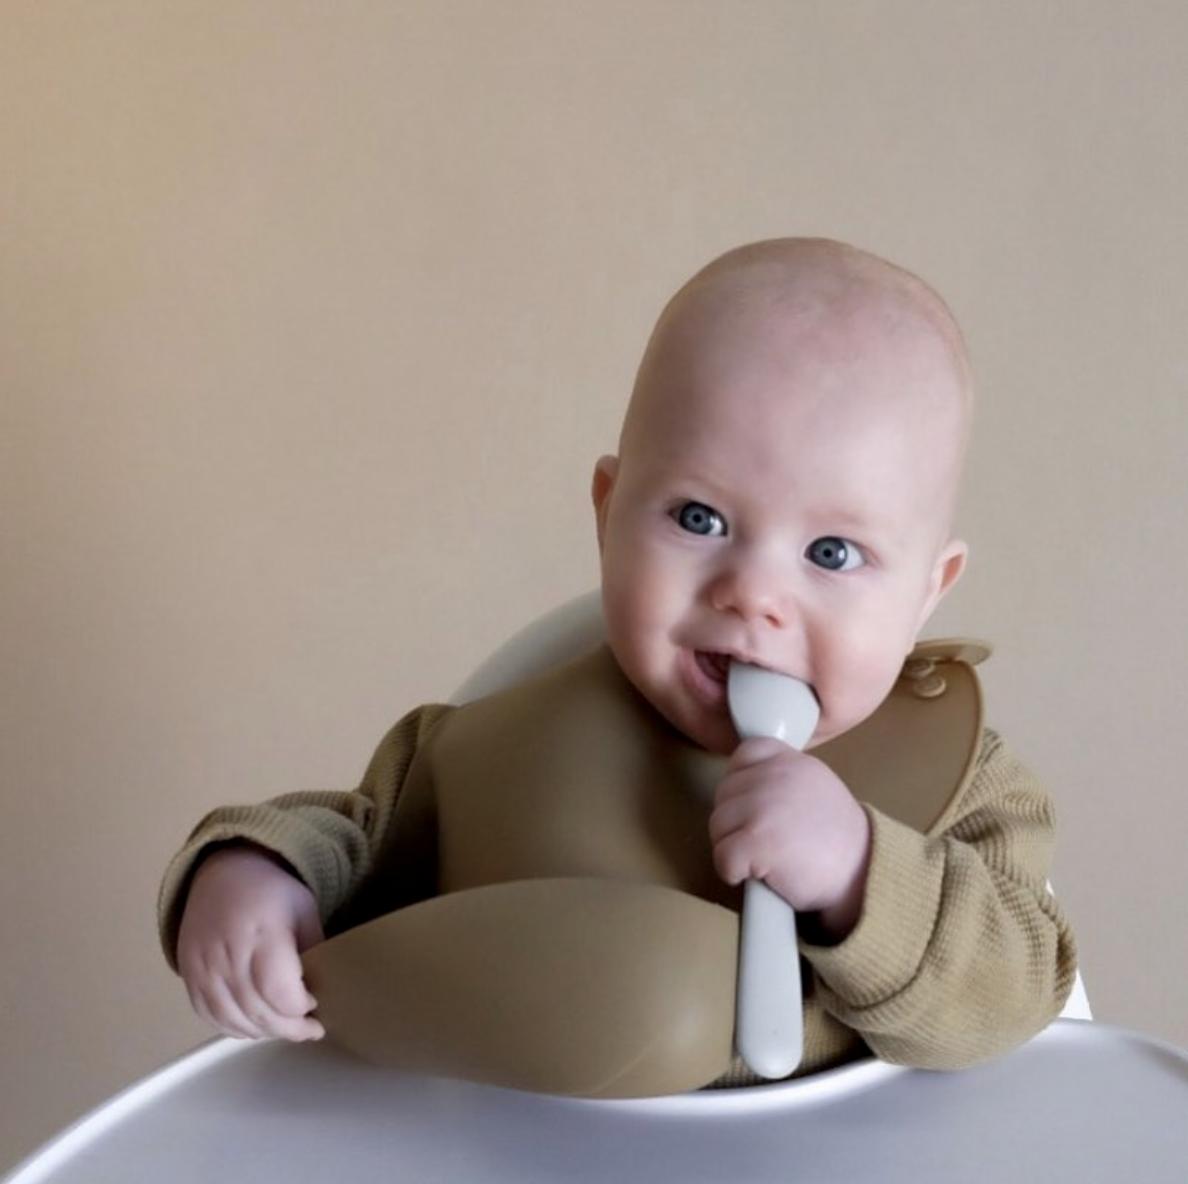 boob to food spoon feeding baby romper bib